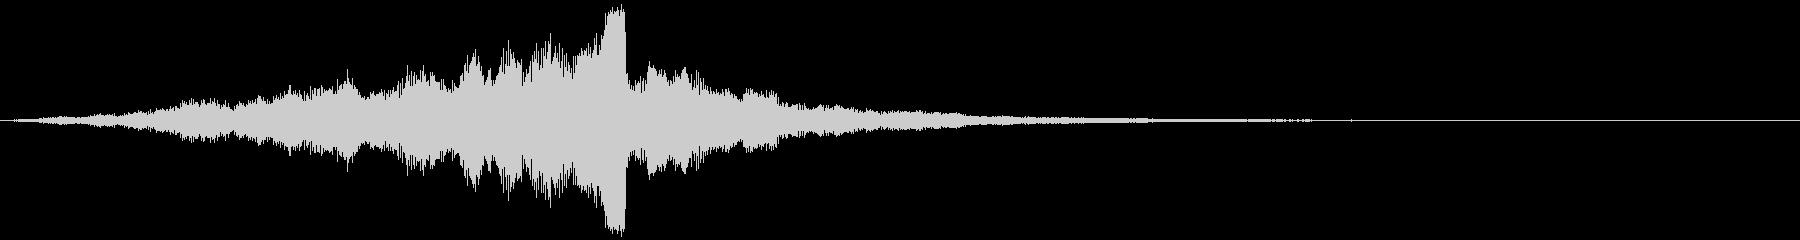 CINEMATICな音で始まる映像_02の未再生の波形